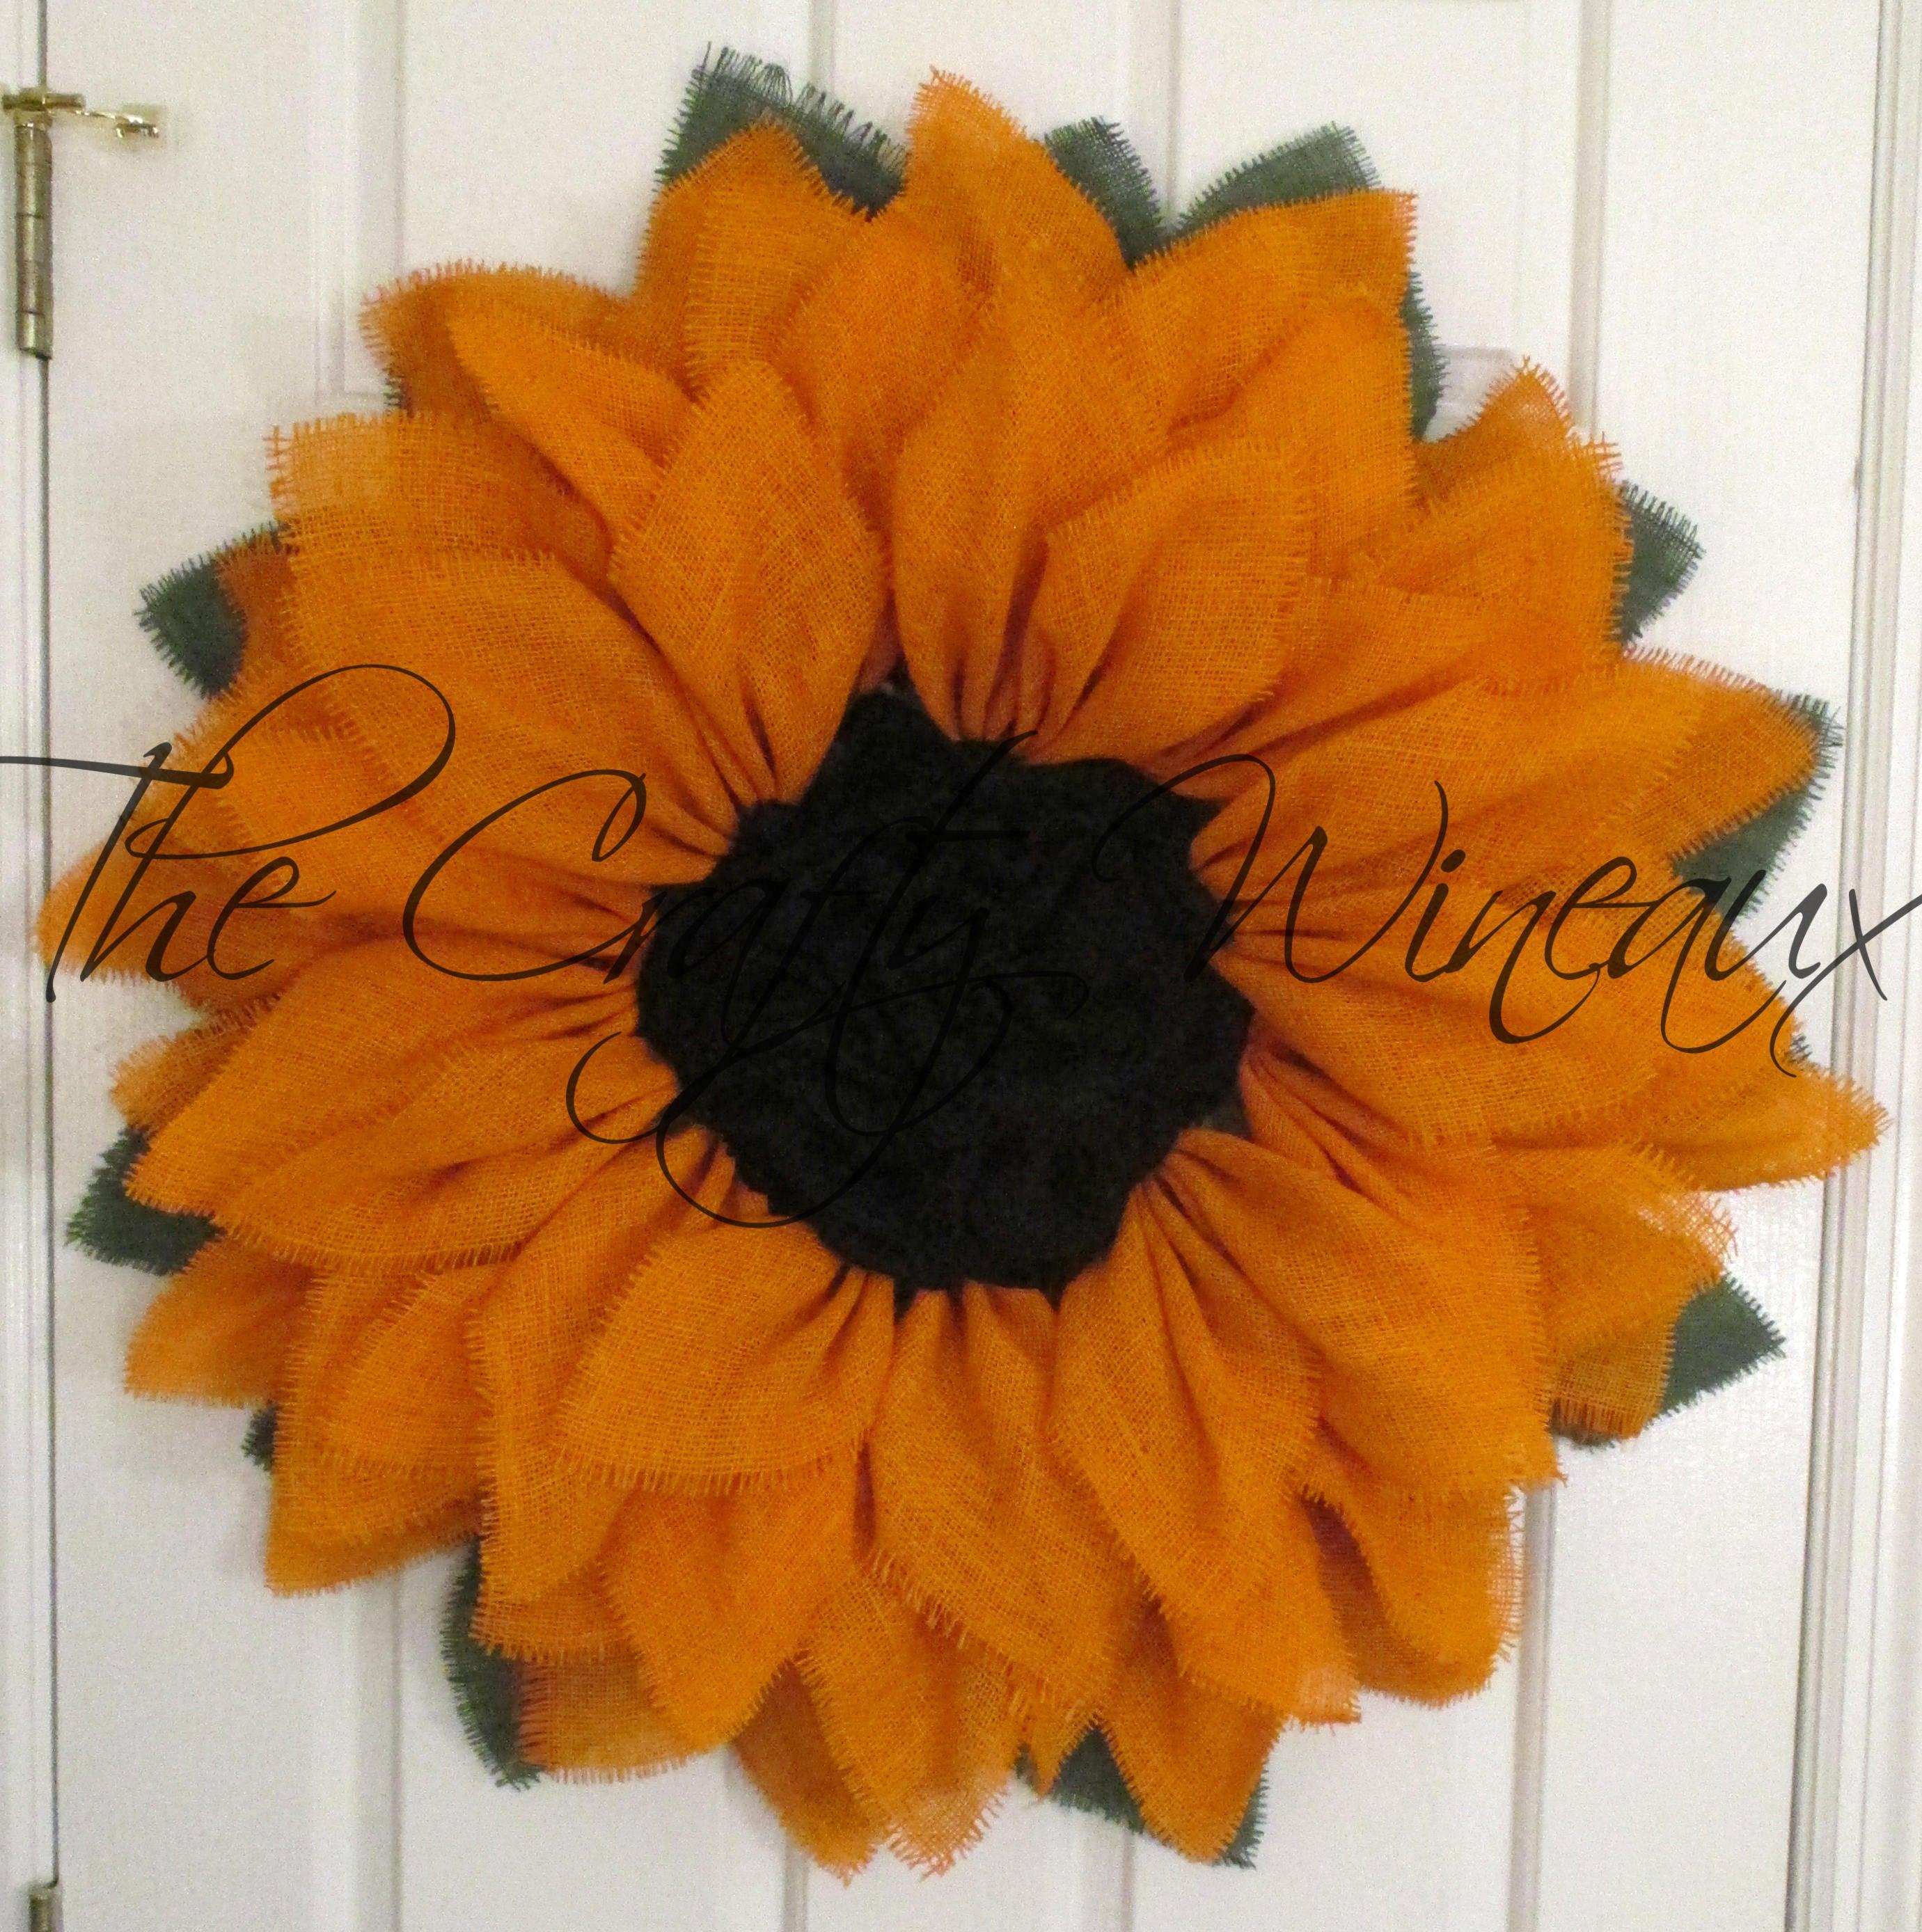 Burlap Wreath Free Shipping Spring Flower Wreath THE ORIGINAL Yellow Burlap Sunflower Wreath Sunflower Door Hanger Summer Sunflower